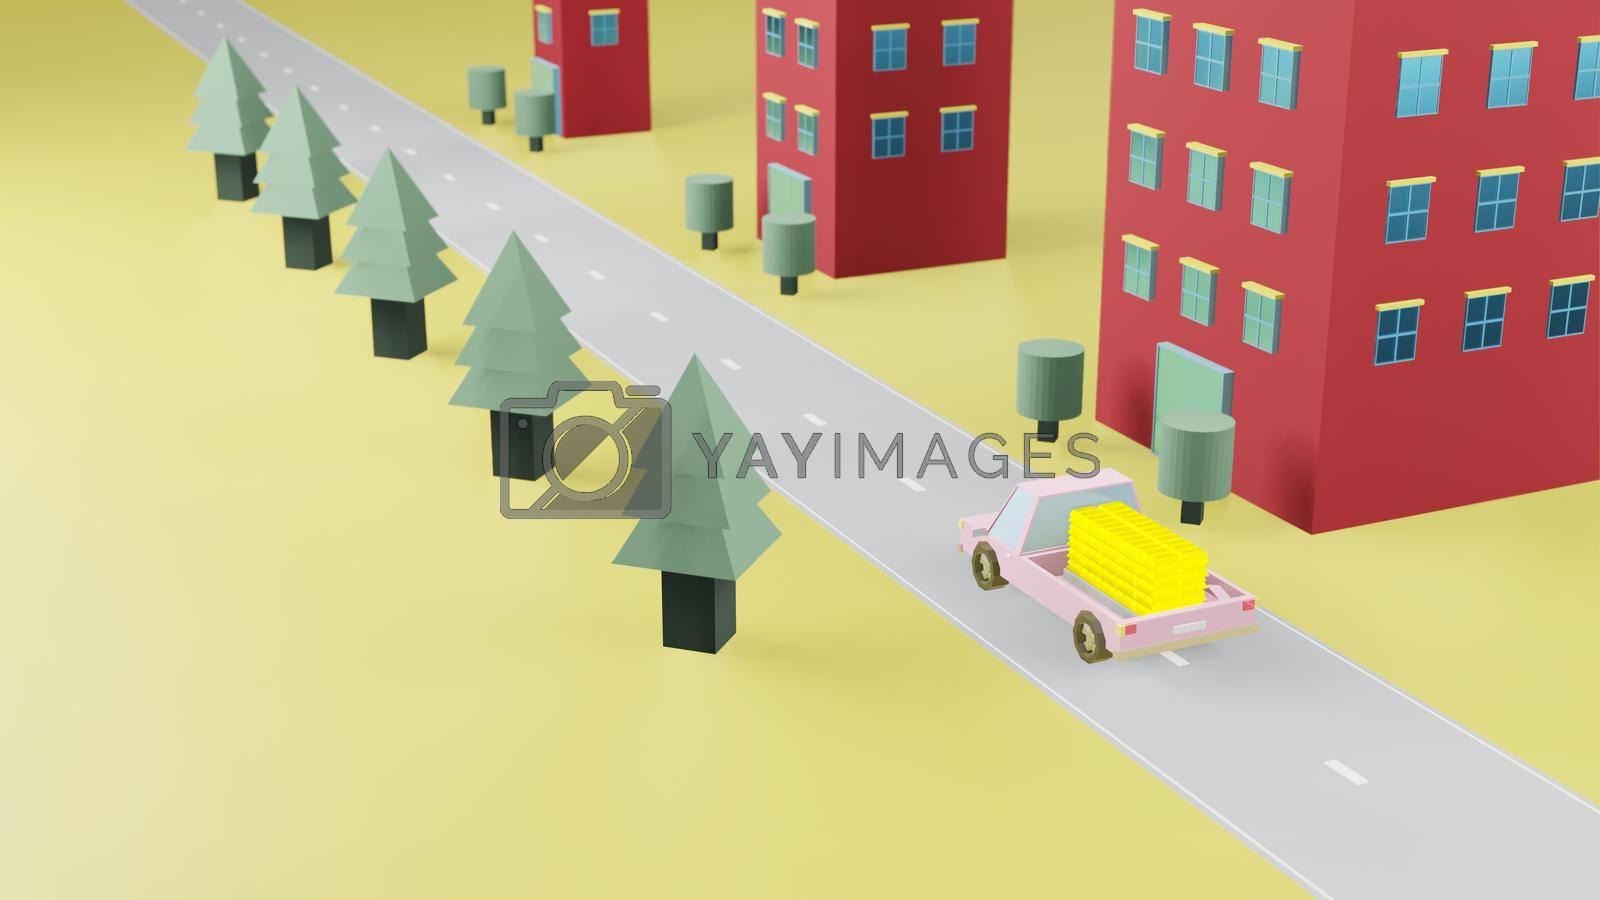 Royalty free image of Truck transport stack fine gold bar on road 3d render by eaglesky